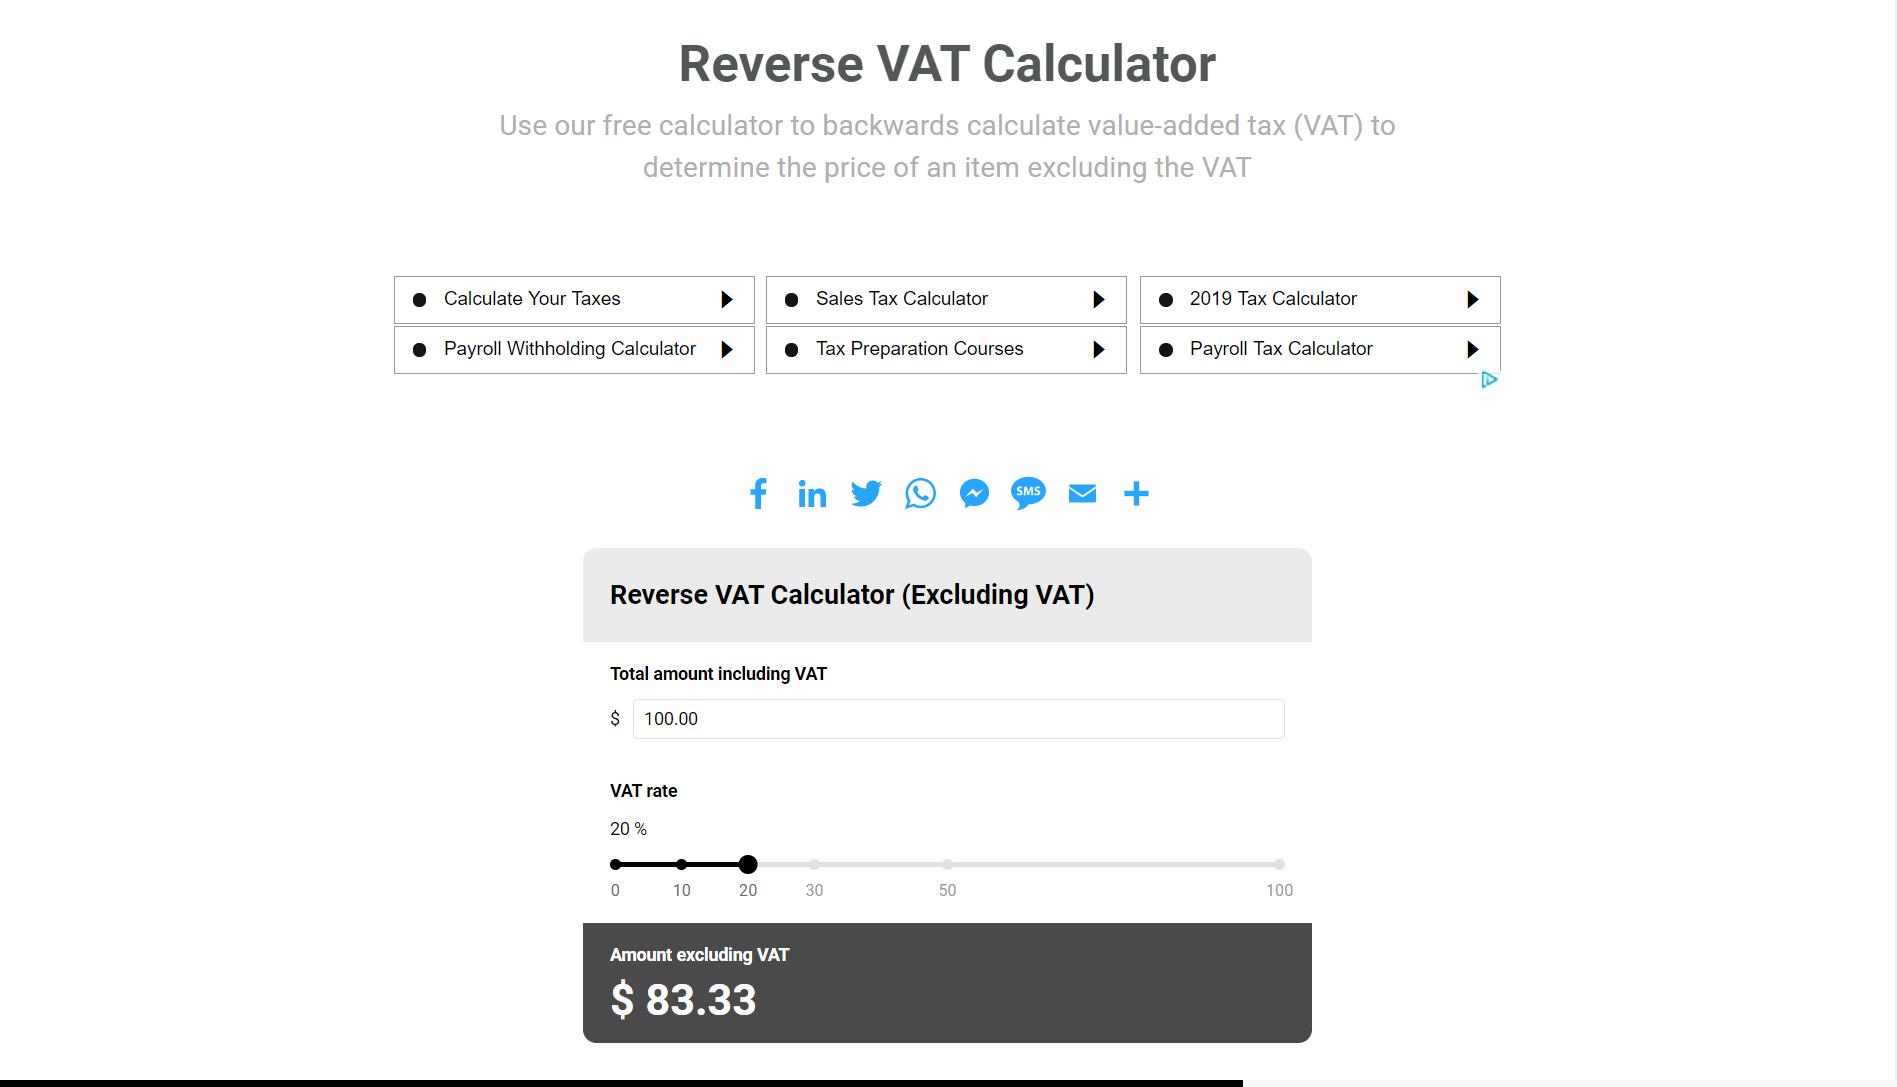 Reverse Vat Calculator Value Added Tax Calculator Free Online Tools